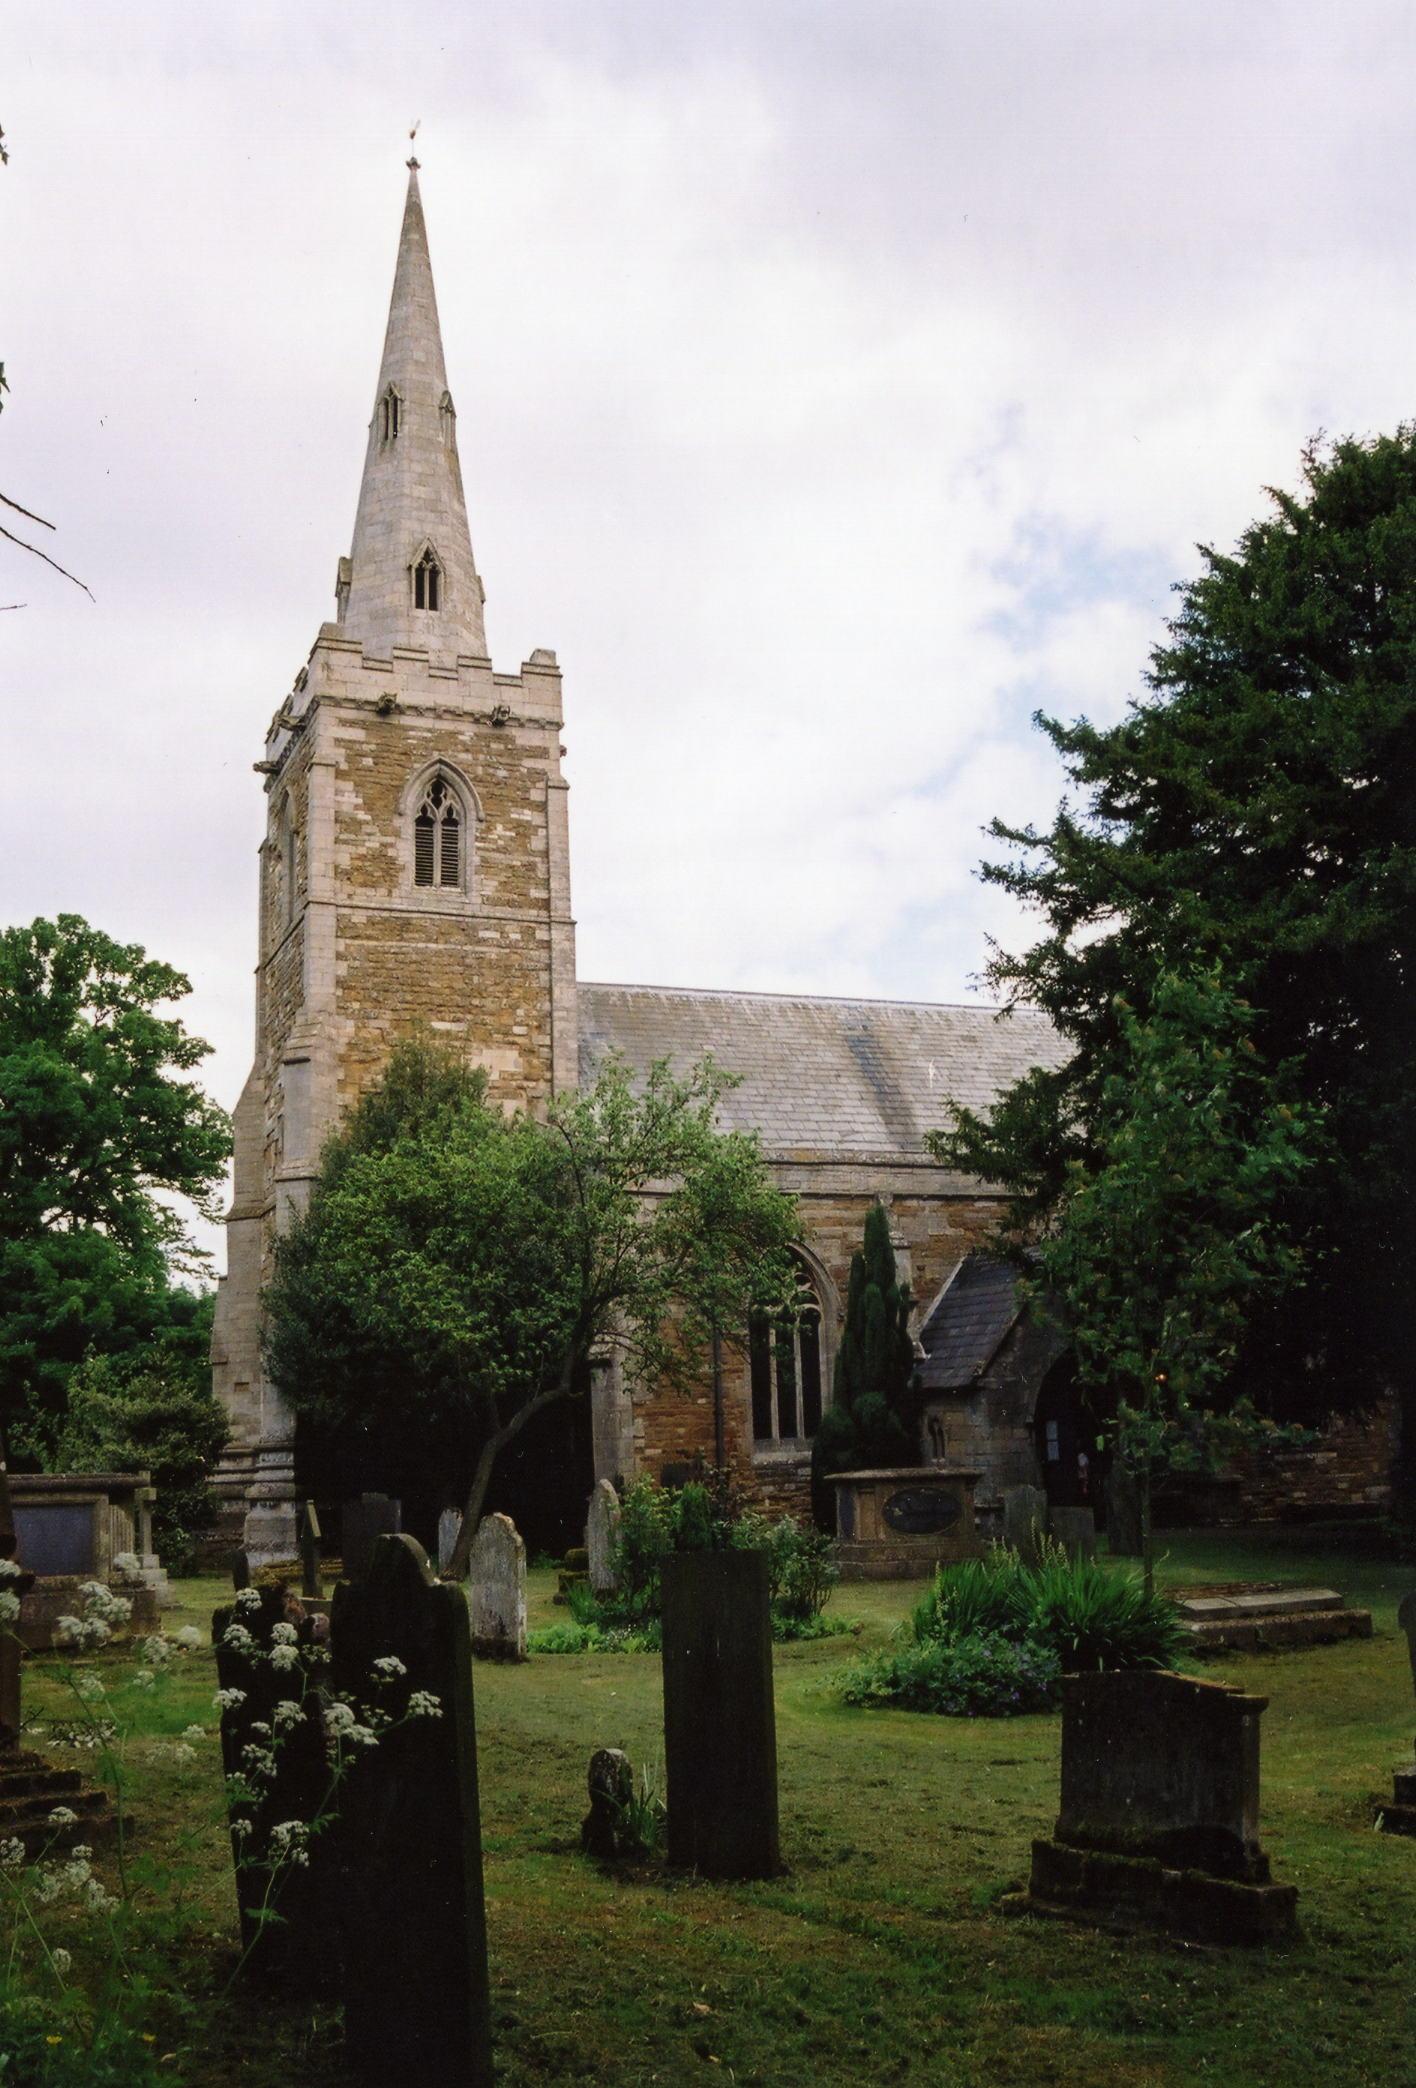 Barrowby All Saints parish church